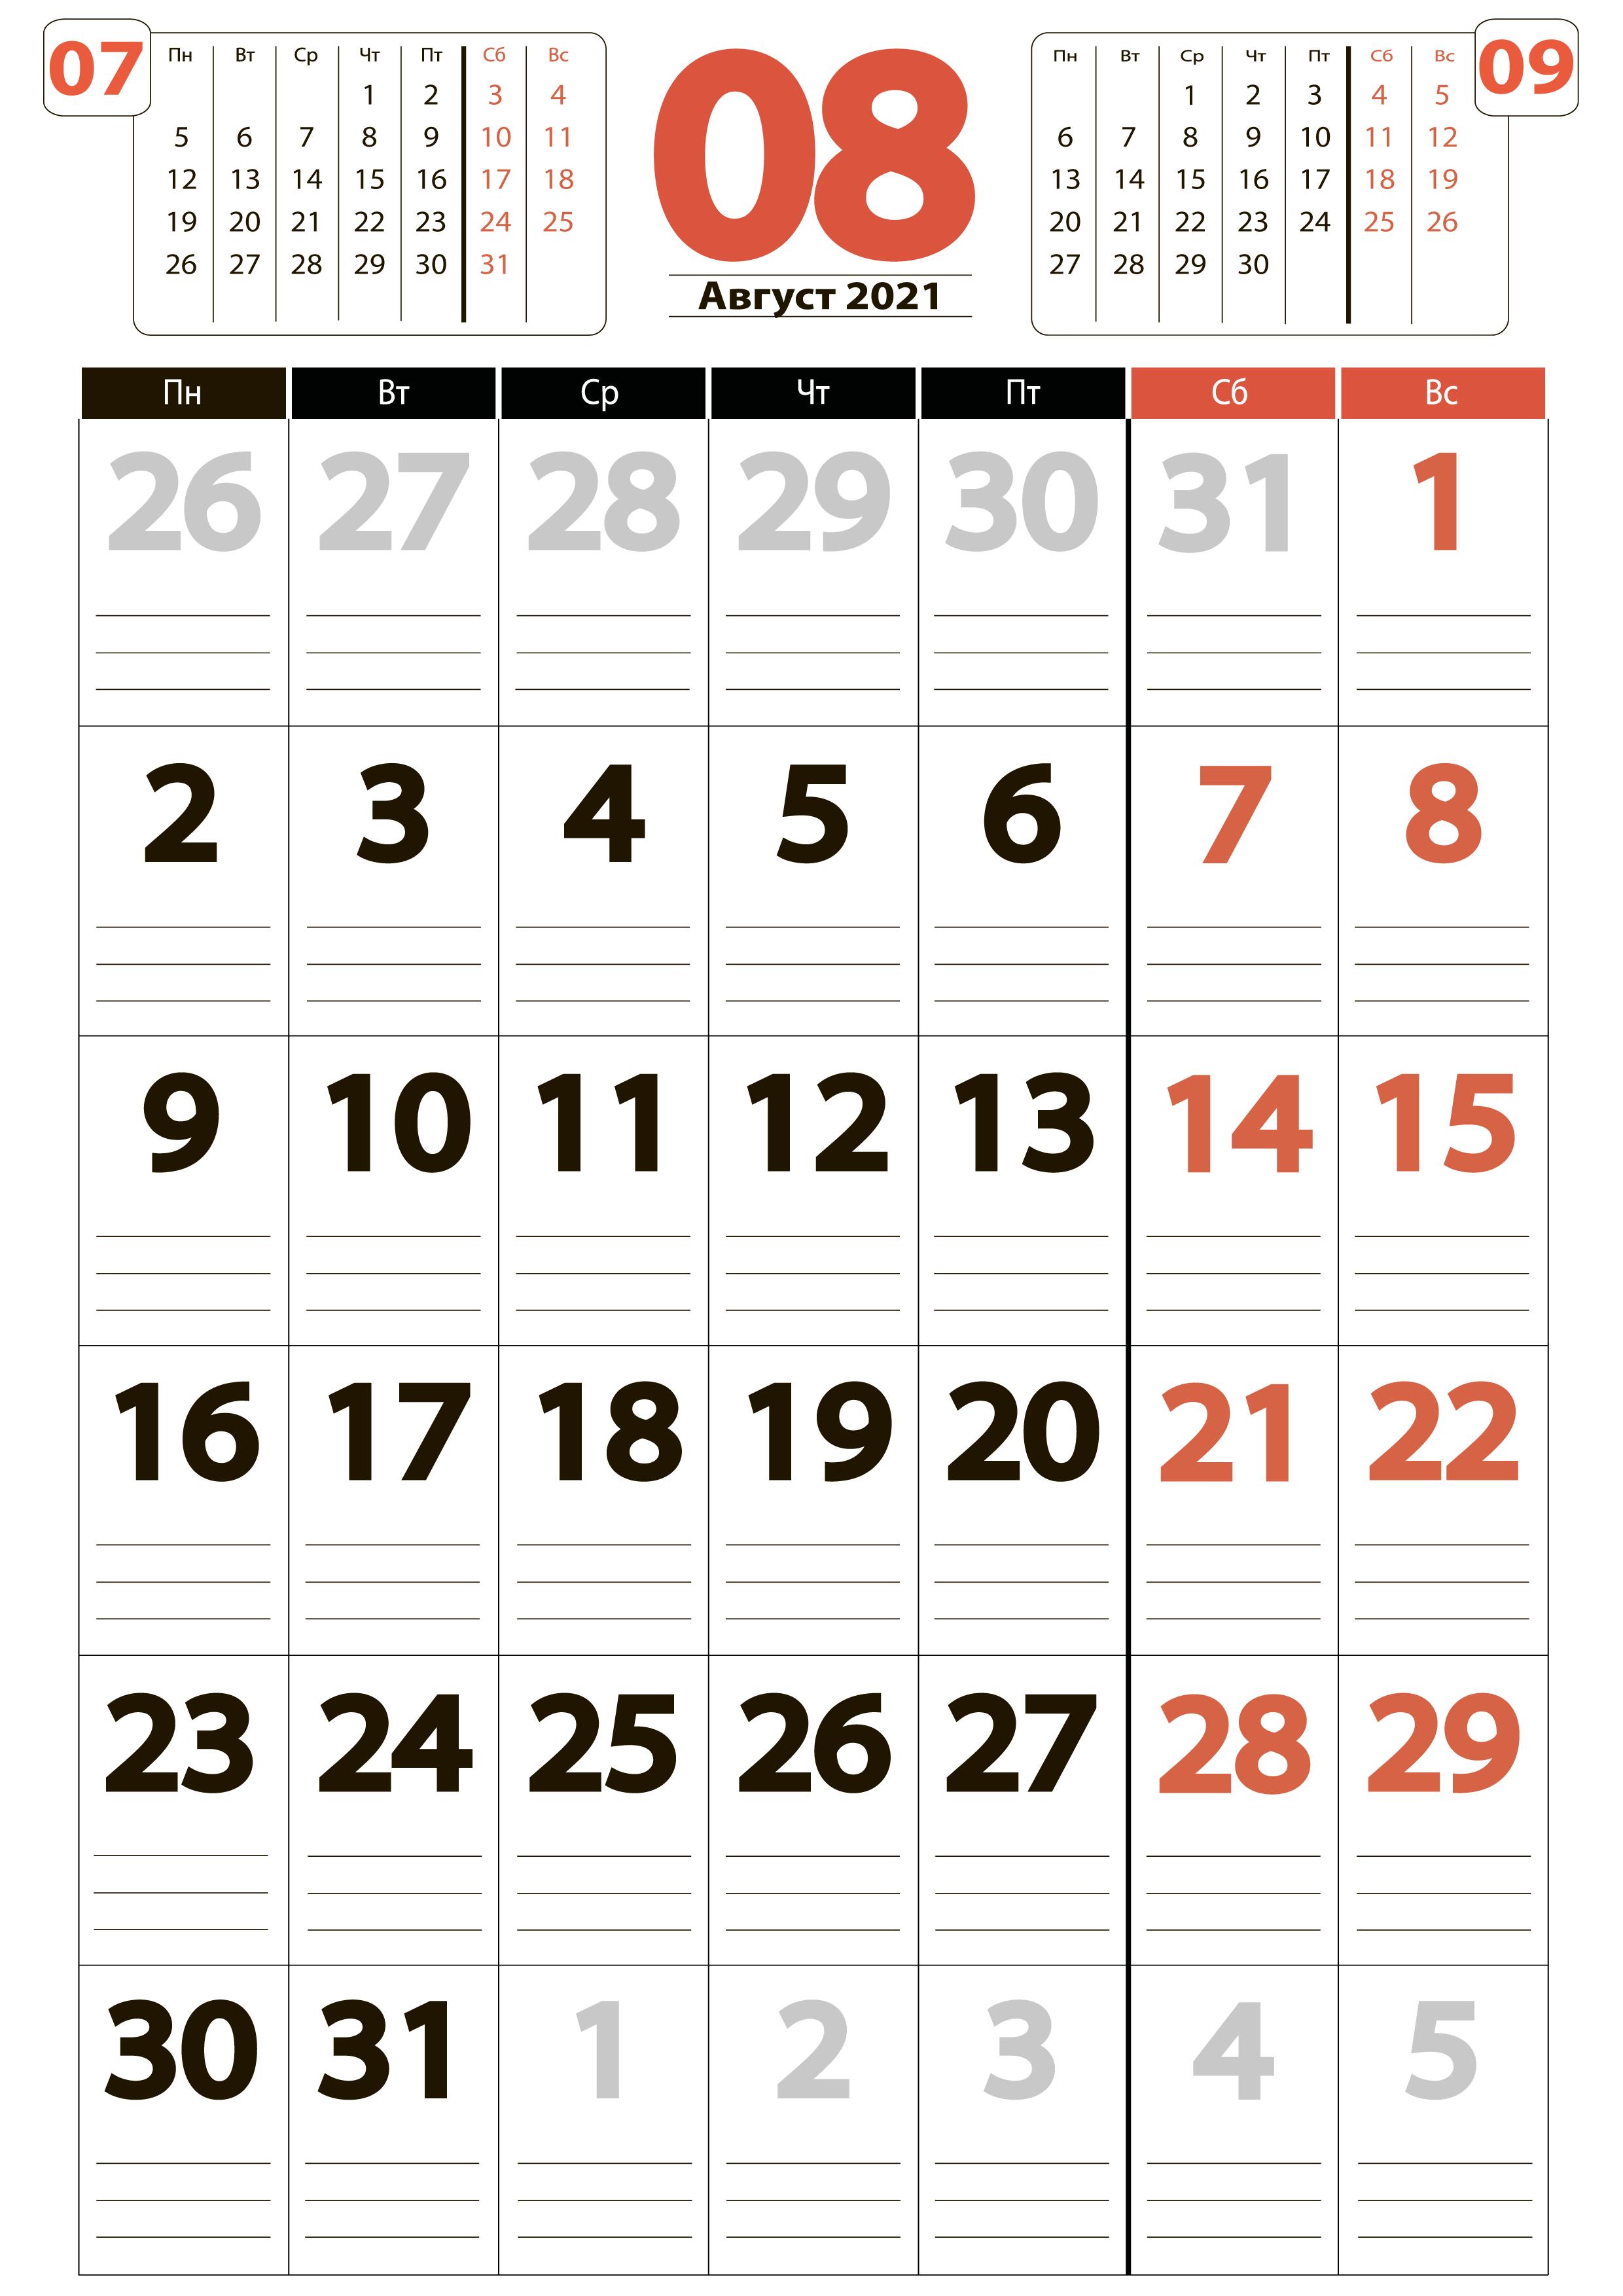 Август 2021 - Календарь книжный формат